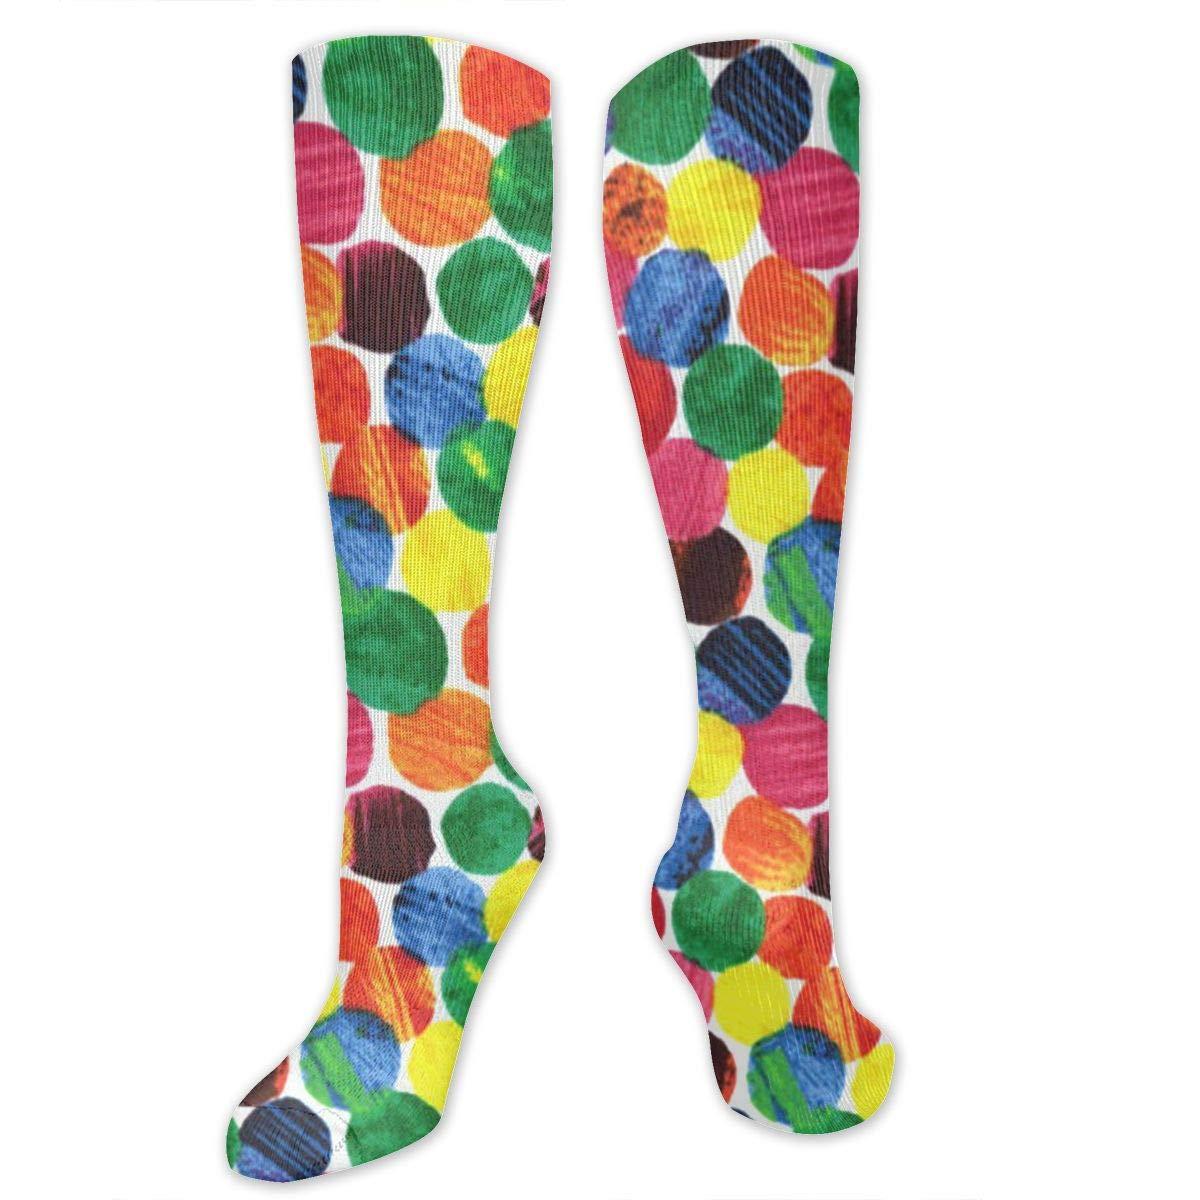 Willbegood99 The Very Hungry Caterpillar Abstract Dots Mens Fun Dress Socks Colorful Pattened Novelty Mid-Calf Crew Socks Premium Cotton Vibrant Art Socks